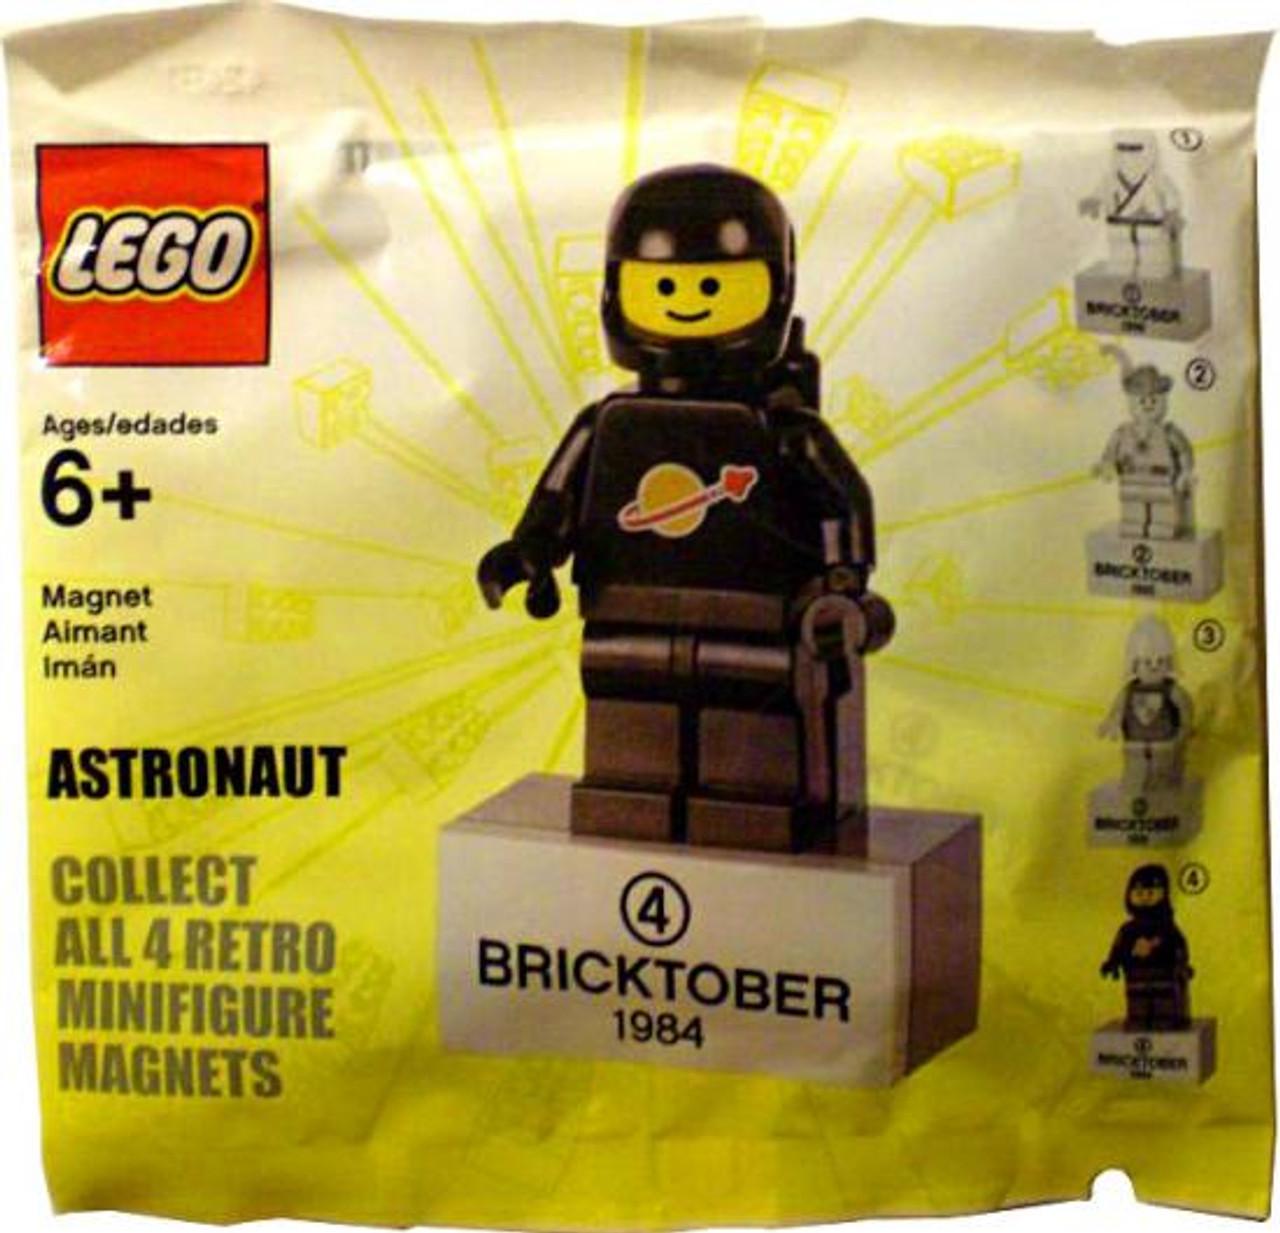 LEGO Exclusives Astronaut Exclusive Minifigure Magnet #4